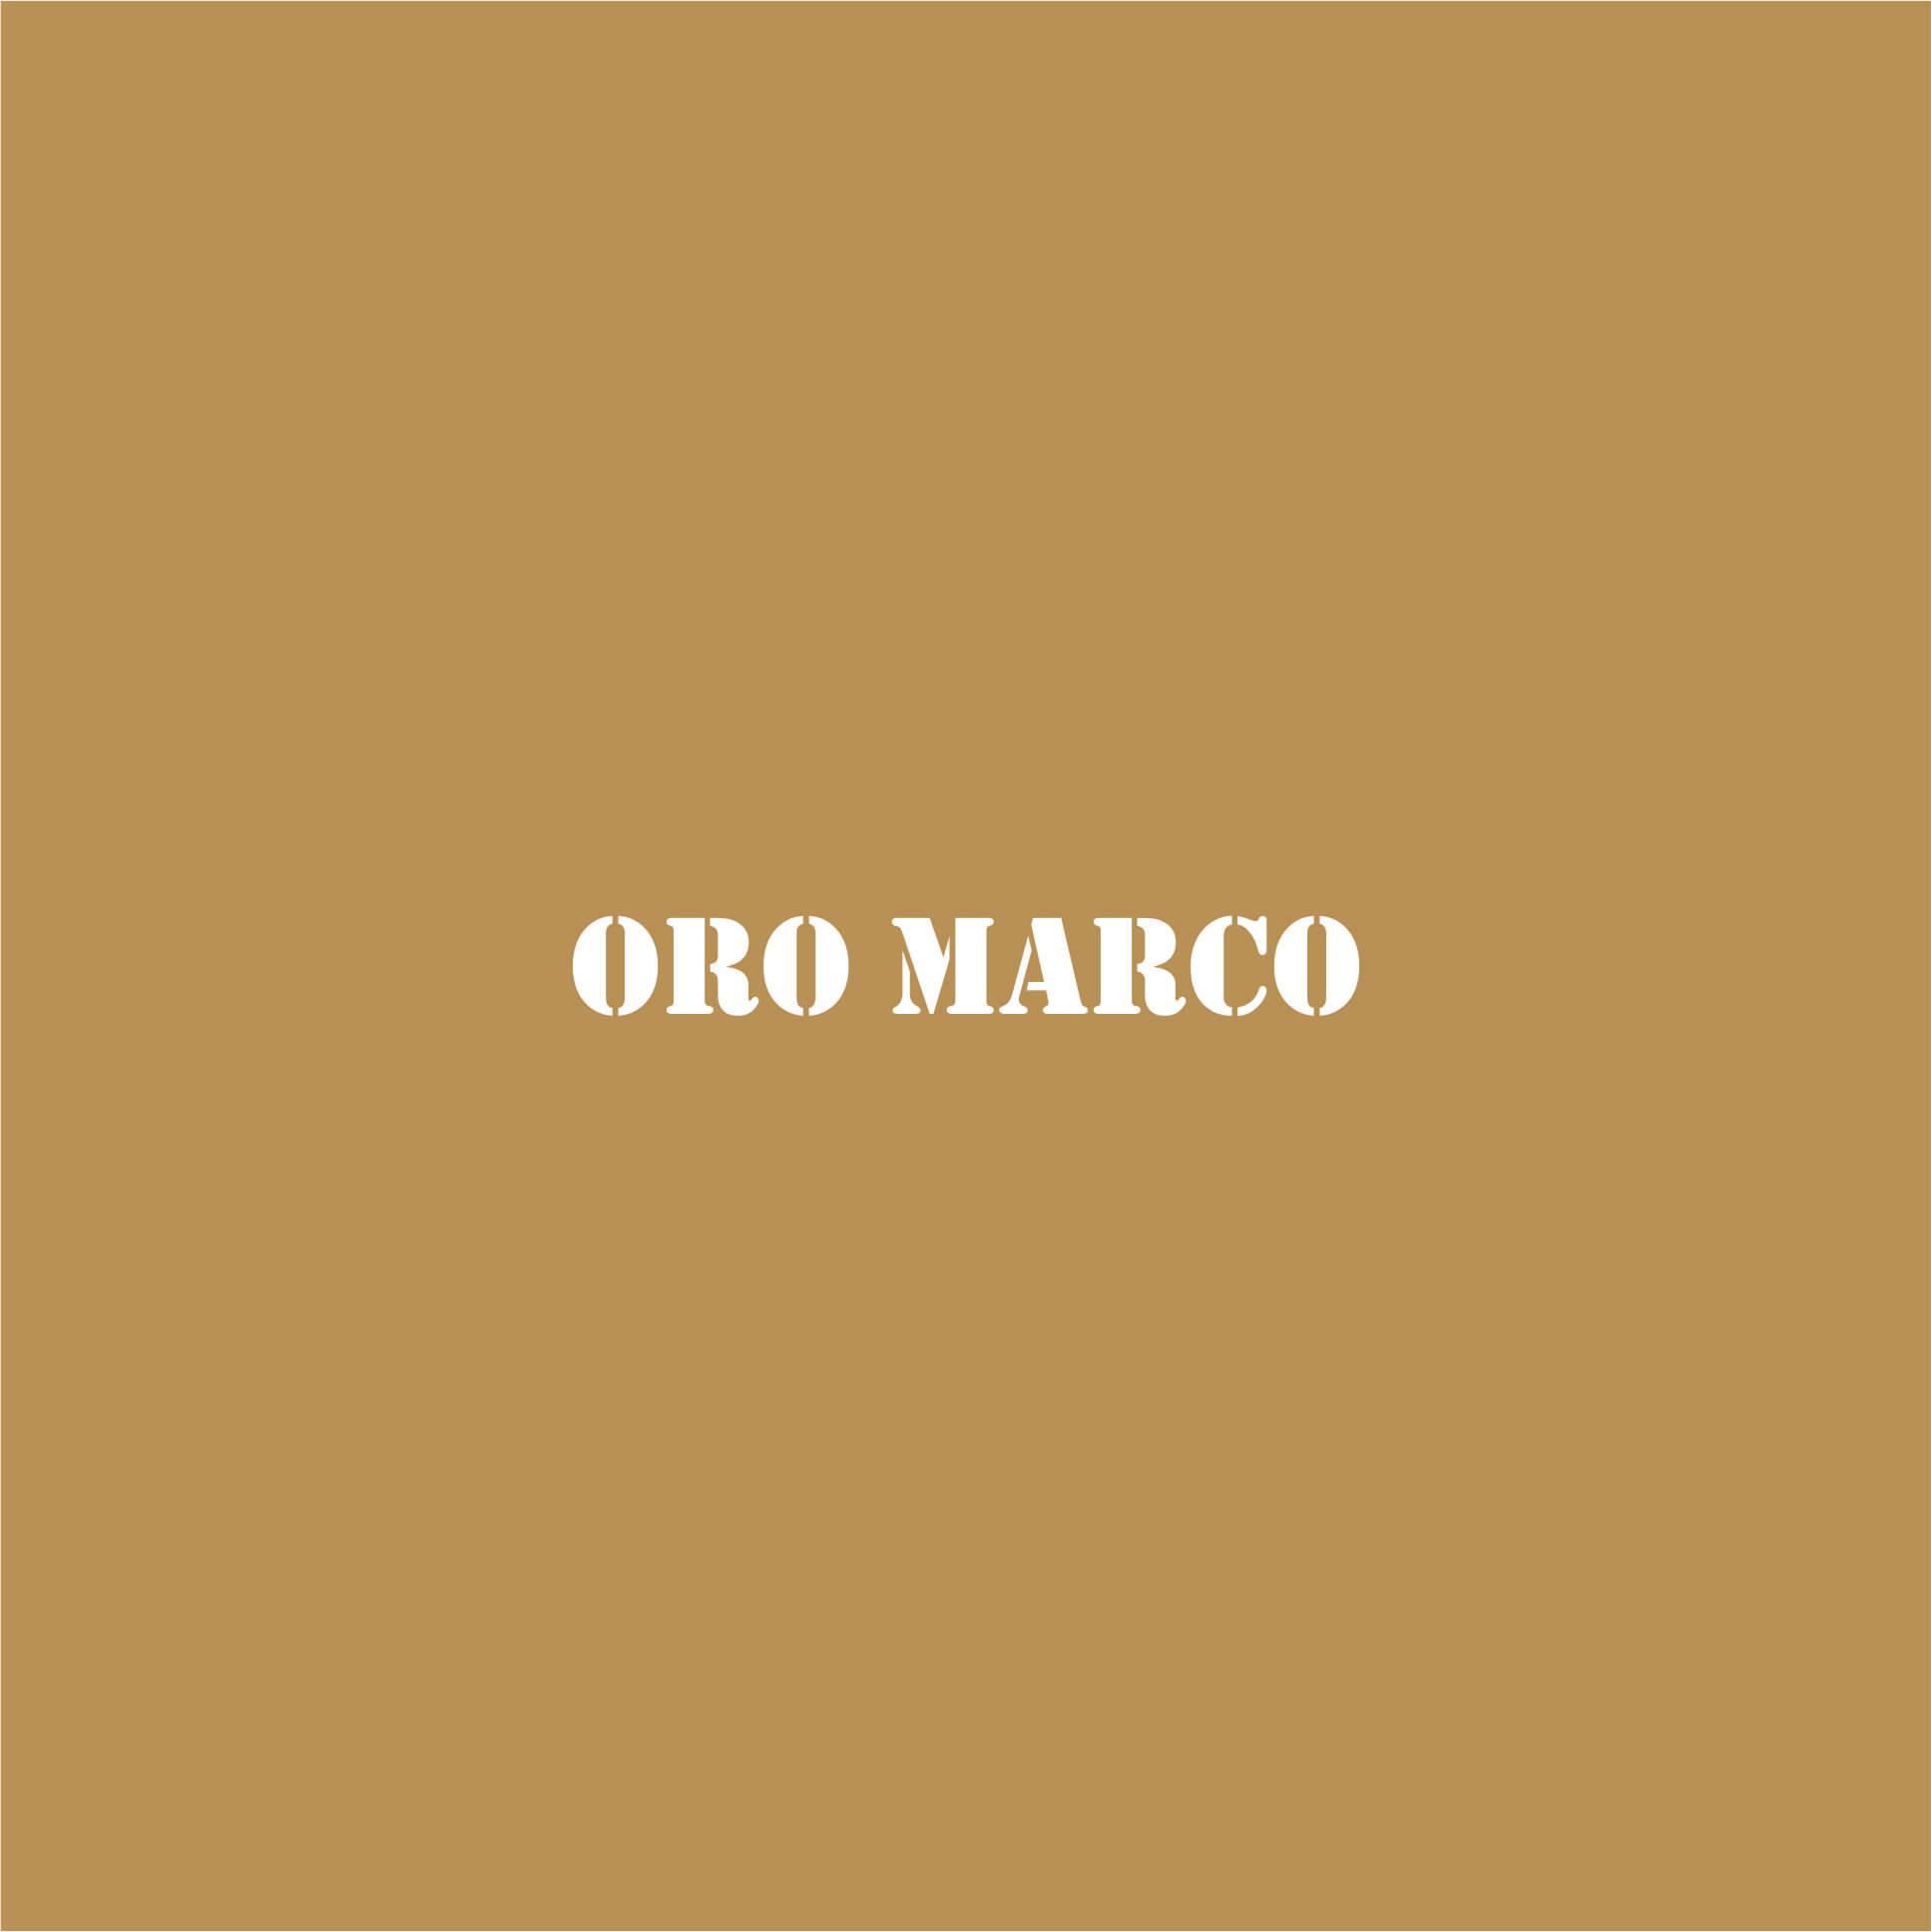 Spray Montana 94 oro marco - La Marquesita - Manualidades en madera